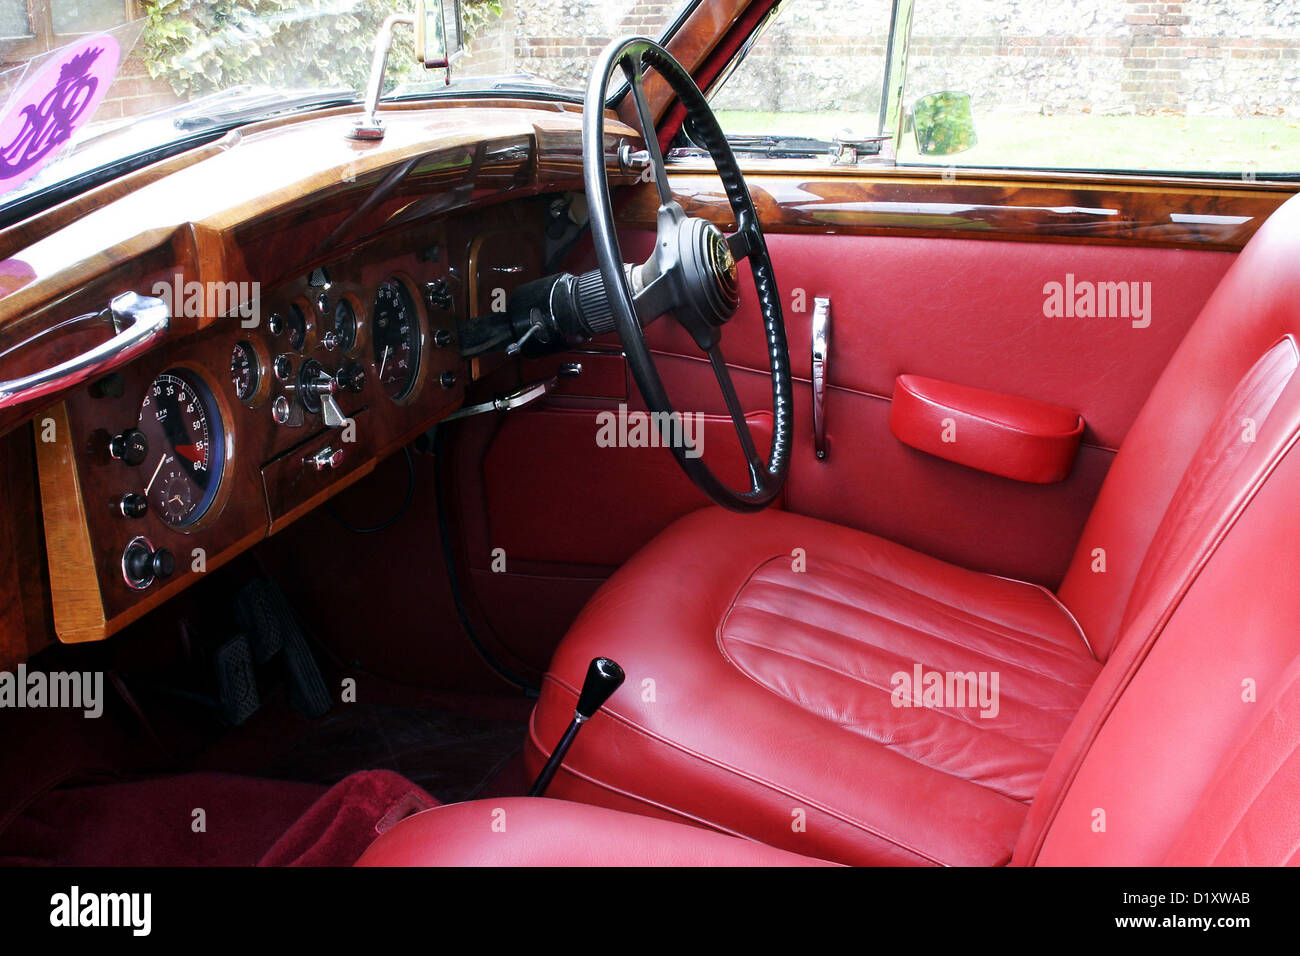 Xk Engine Stock Photos Images Alamy 1950s Jaguar S 1960 Mark Ix The Definitive Big Jag Saloon With Jaguars Wonderful 38